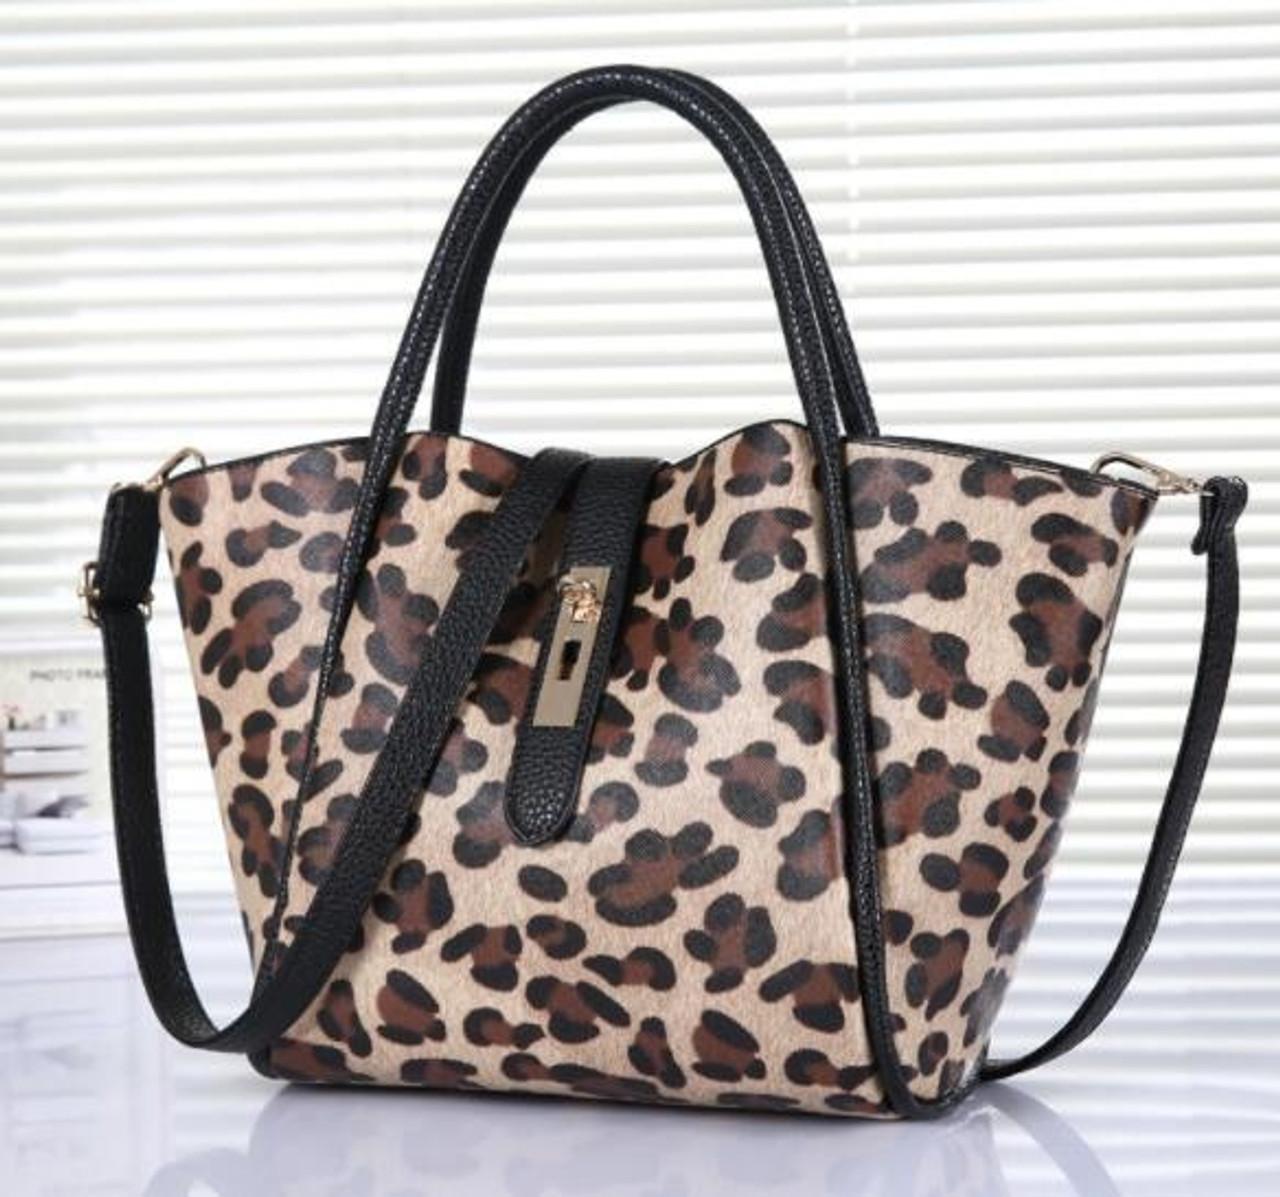 ... Famous Brand designer handbags high quality genuine leather women  shoulder bags casual cowhide Messenger Bags fashion ... f5673573a6a3d